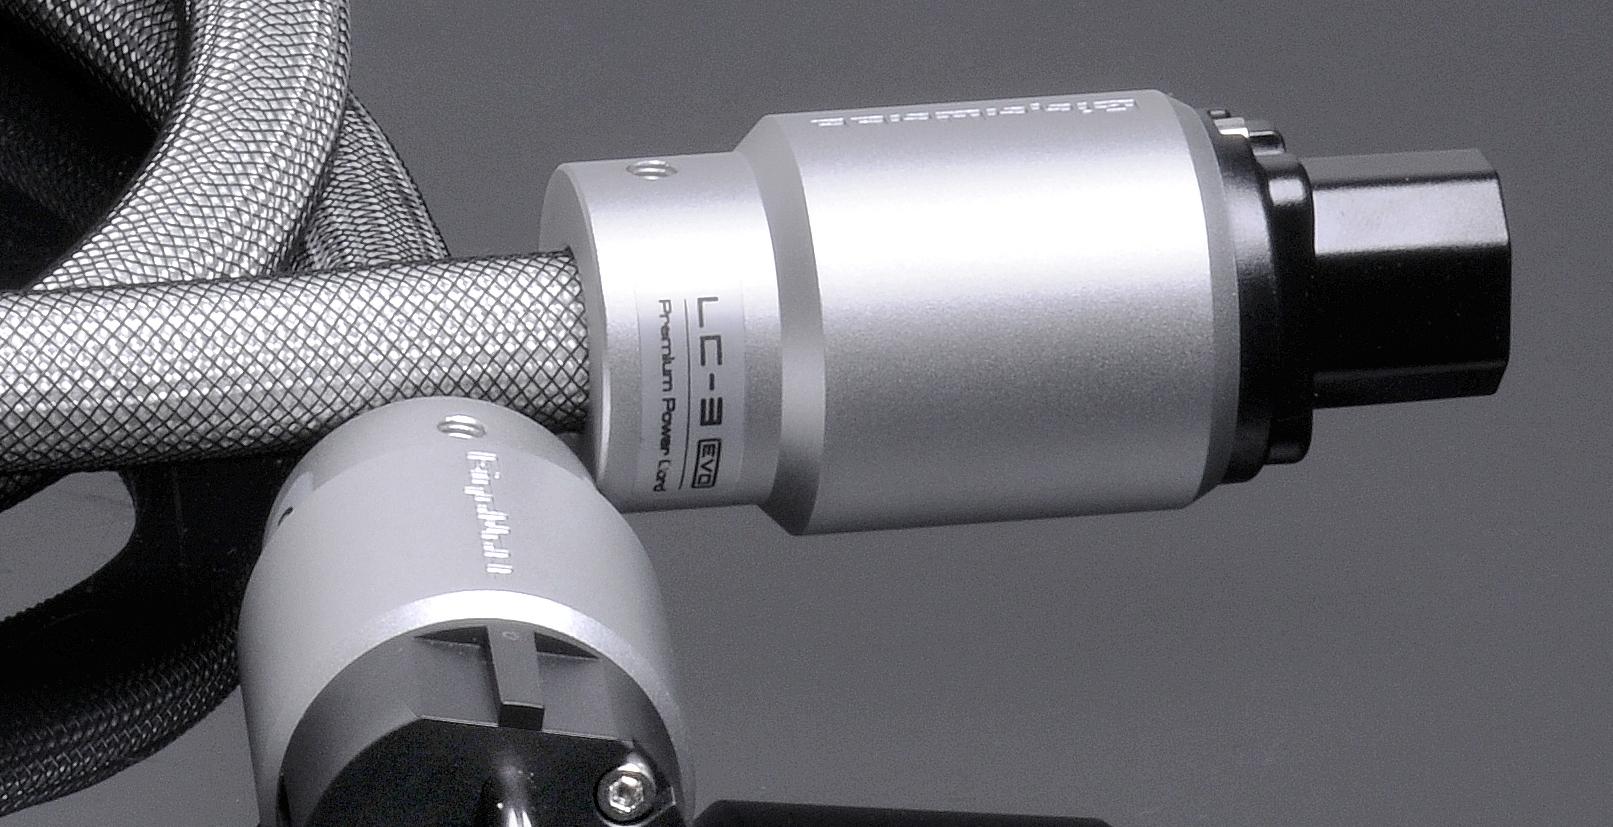 Gigawatt LC-3 EVO 20th Anniversary Edition 1,5m